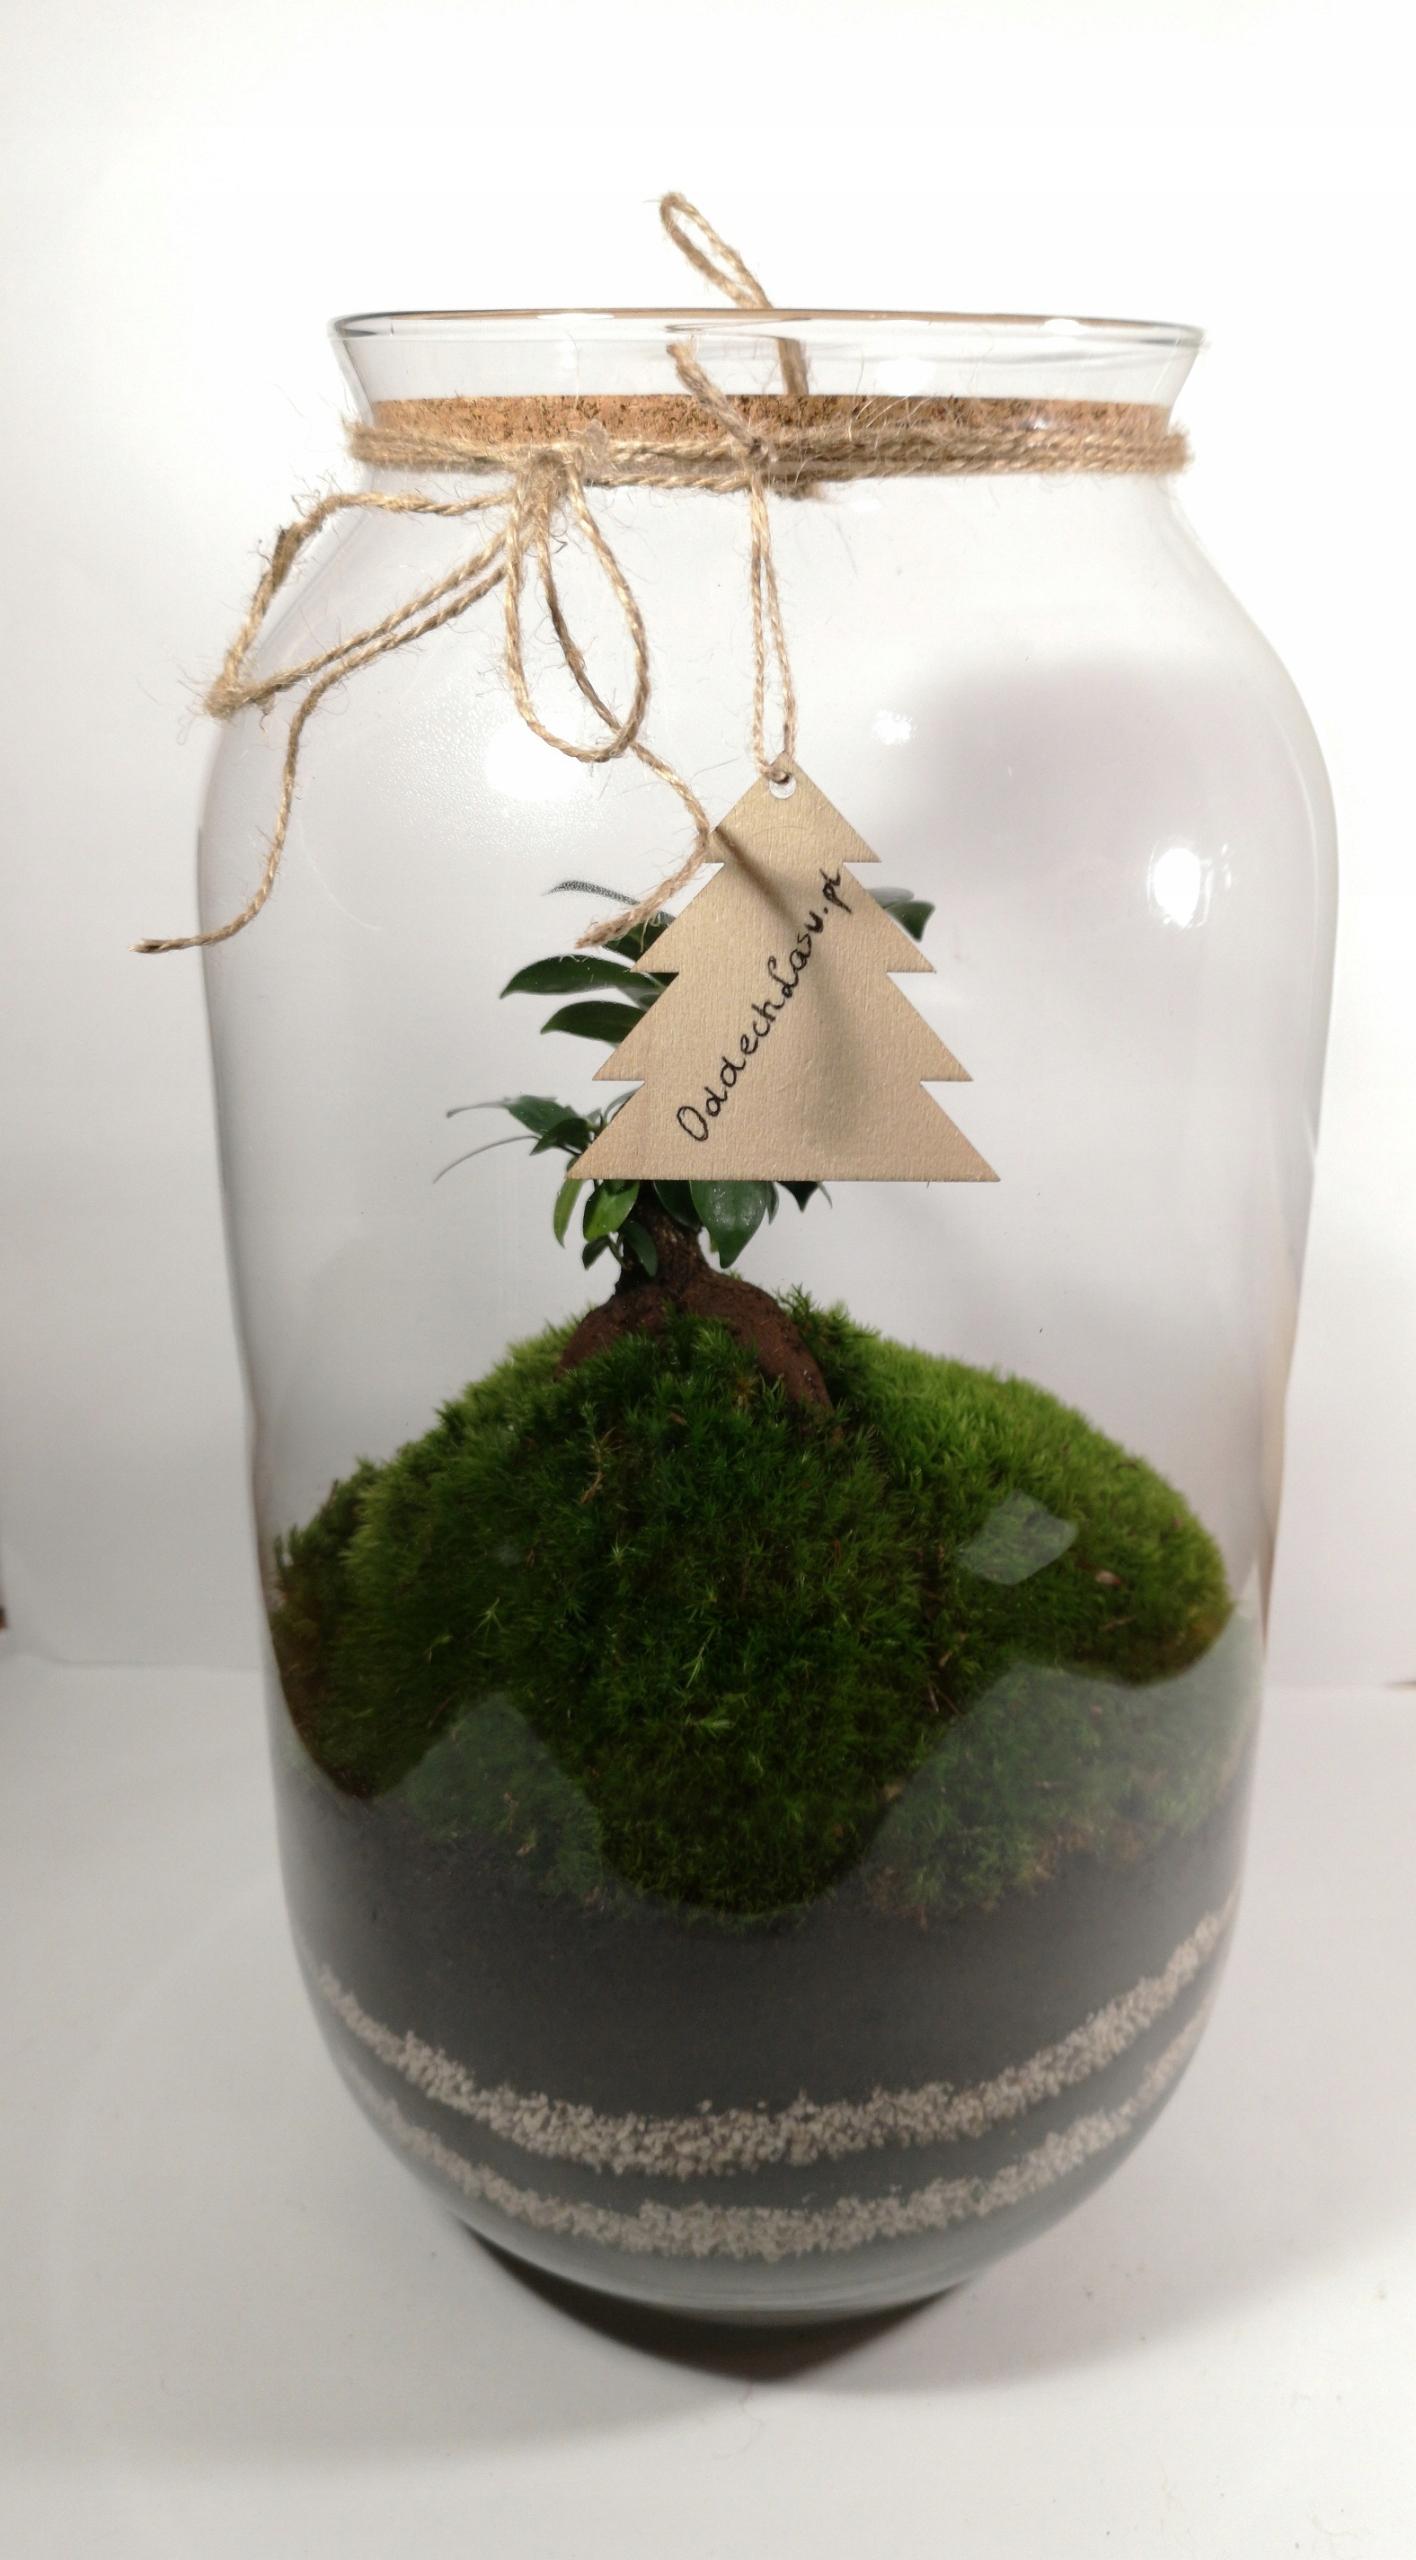 Las w słoiku - Bonsai Fiskus L - Słoik 42 cm